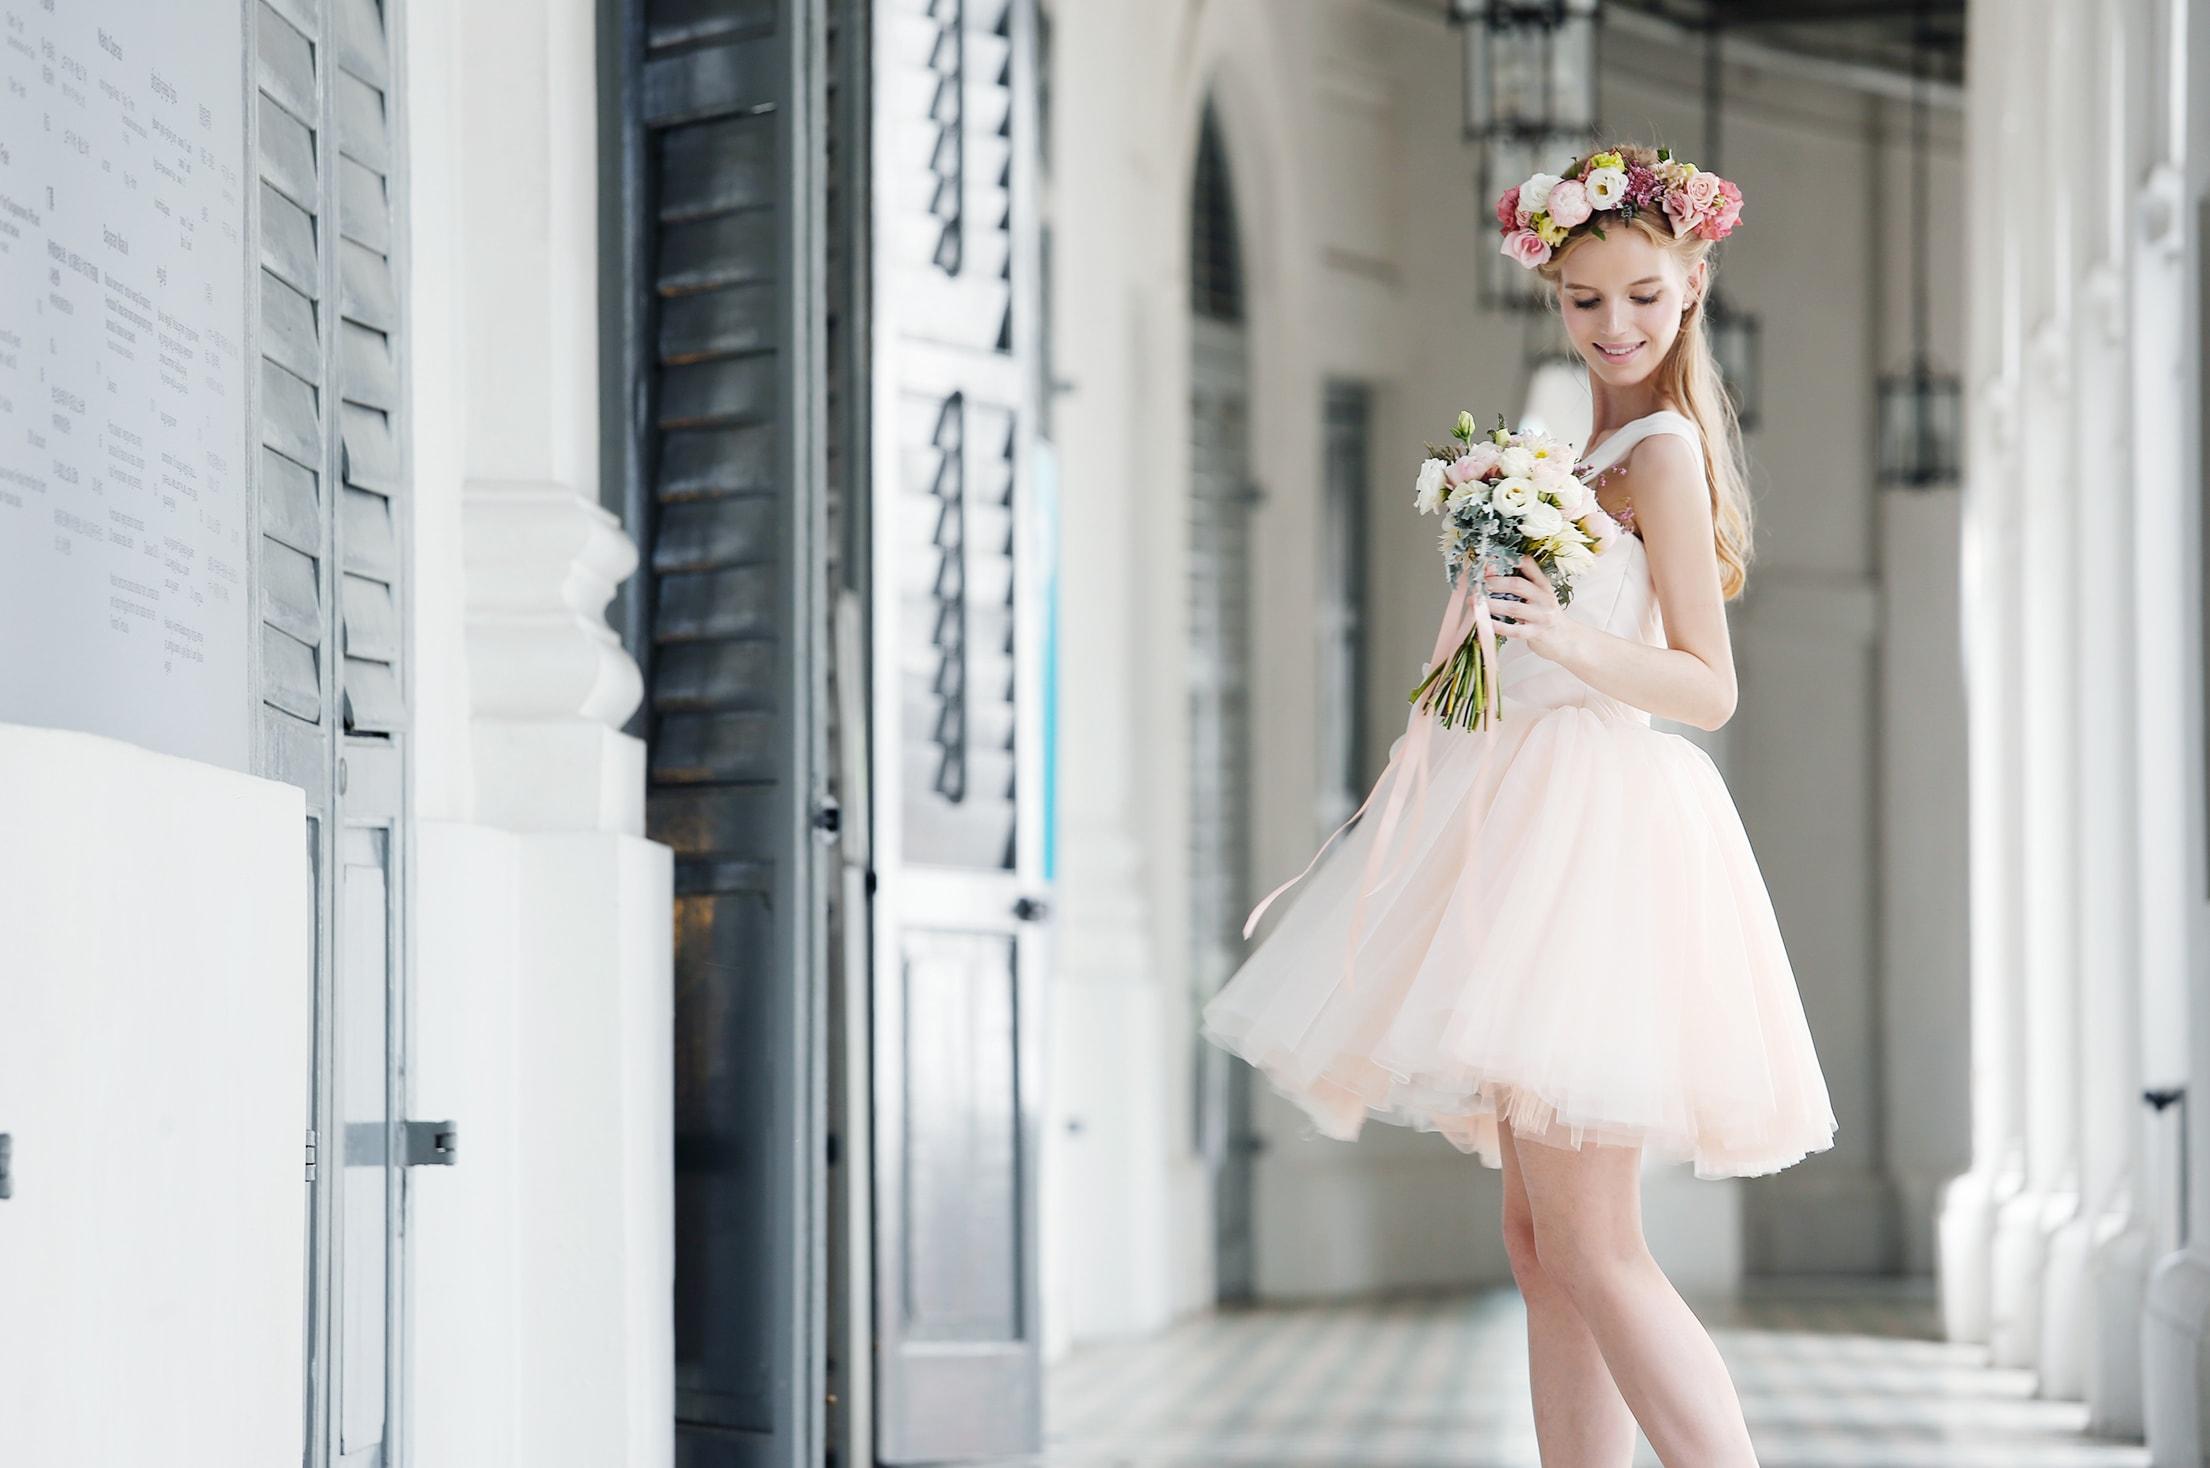 10-Z-Wedding-Pink-Toga-Organza-Ruched-Engagement-Dress